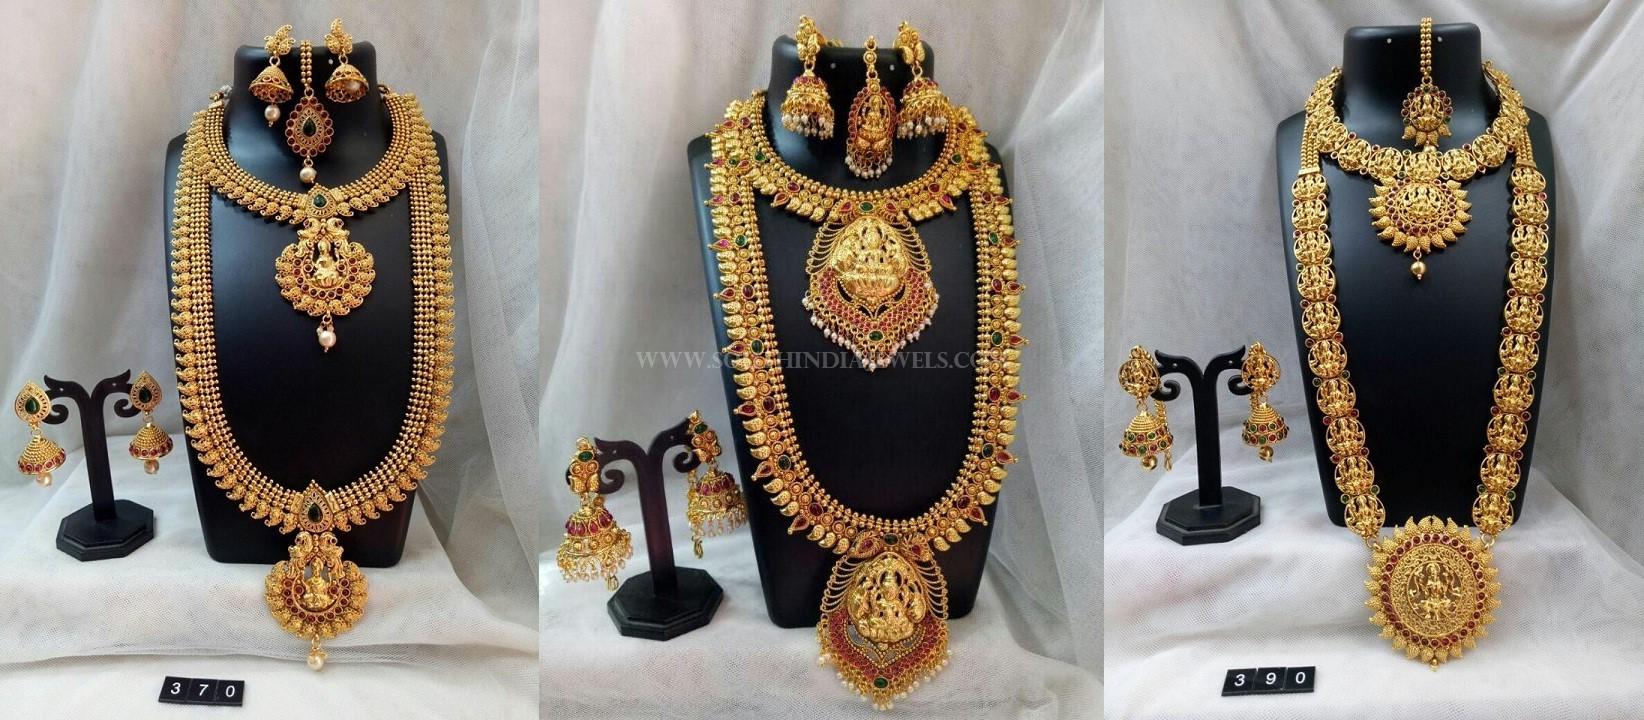 Bridal Temple Jewellery Set From Simma Jewels